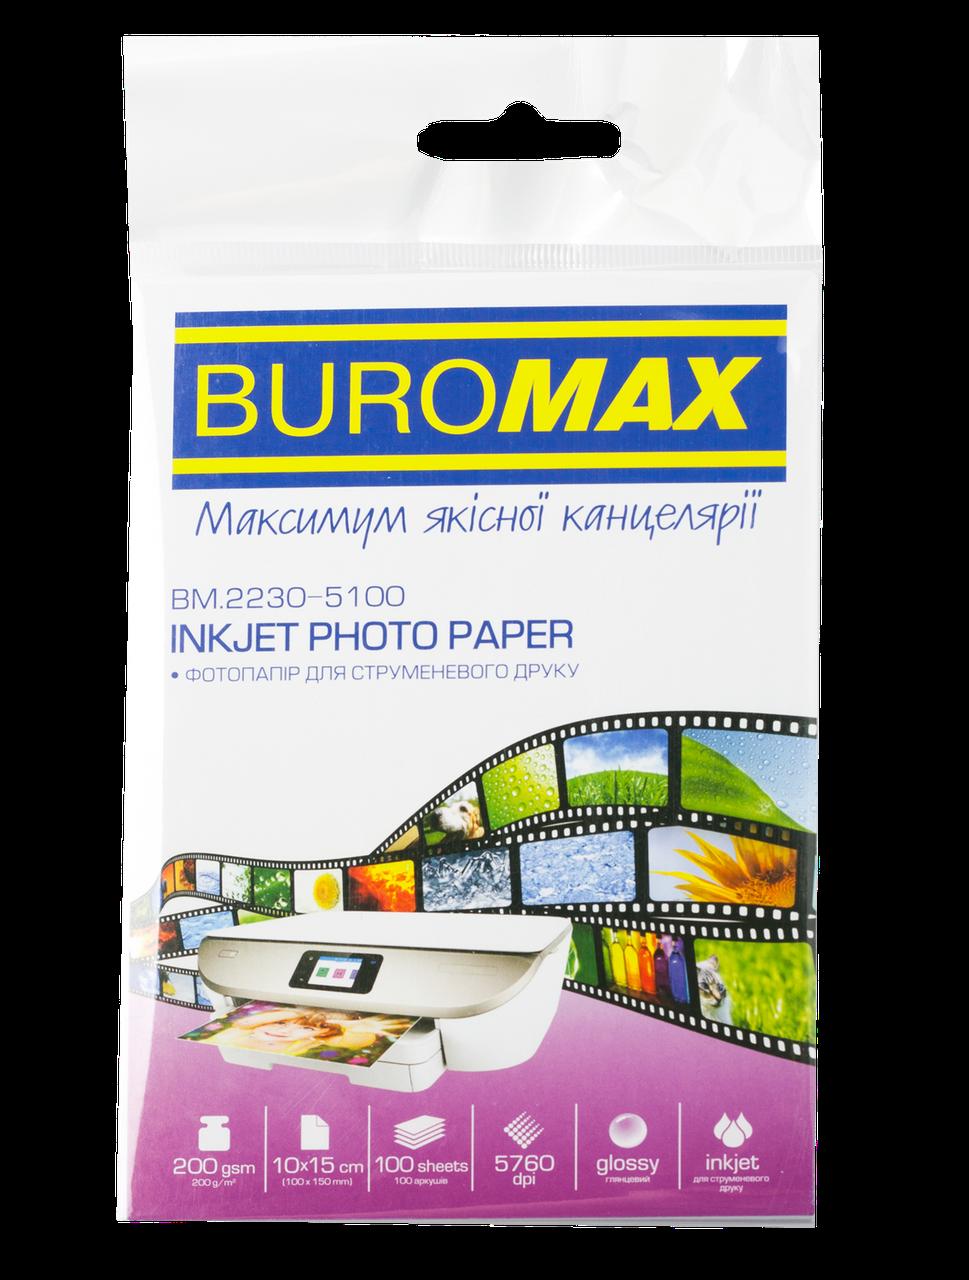 Фотопапір глянцевий, 10х15 см, 200 г/м2, 100 арк..(BM.2230-5100)